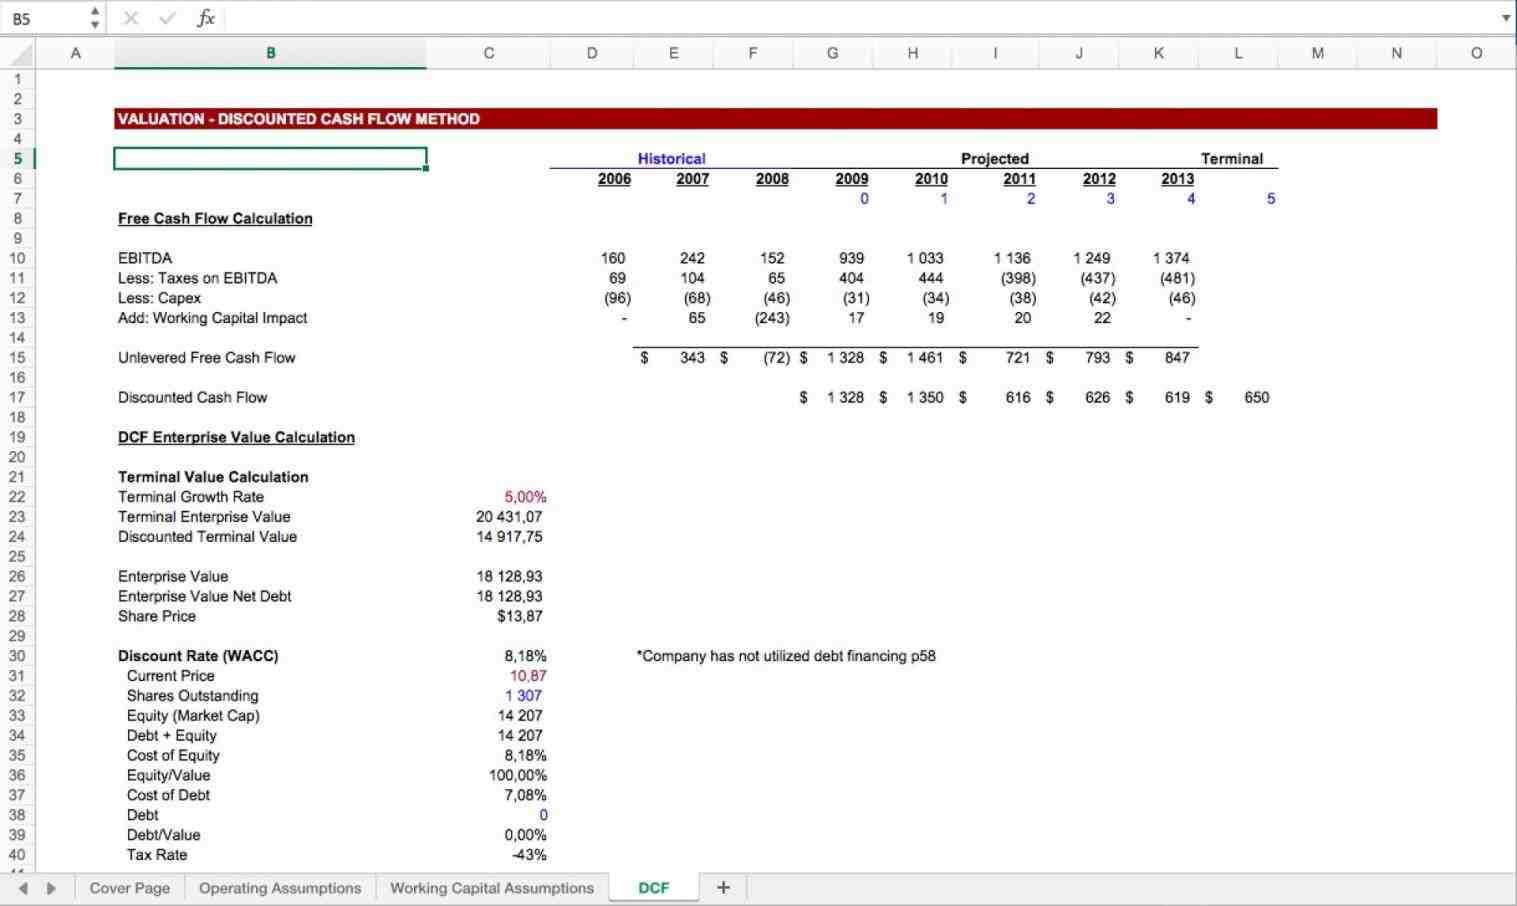 vs fcfe excel model eloquens leveraged buyout lbo rhwritethehappyendingcom vs Discounted Cash Flow Excel Template fcfe valuation excel model eloquens leveraged